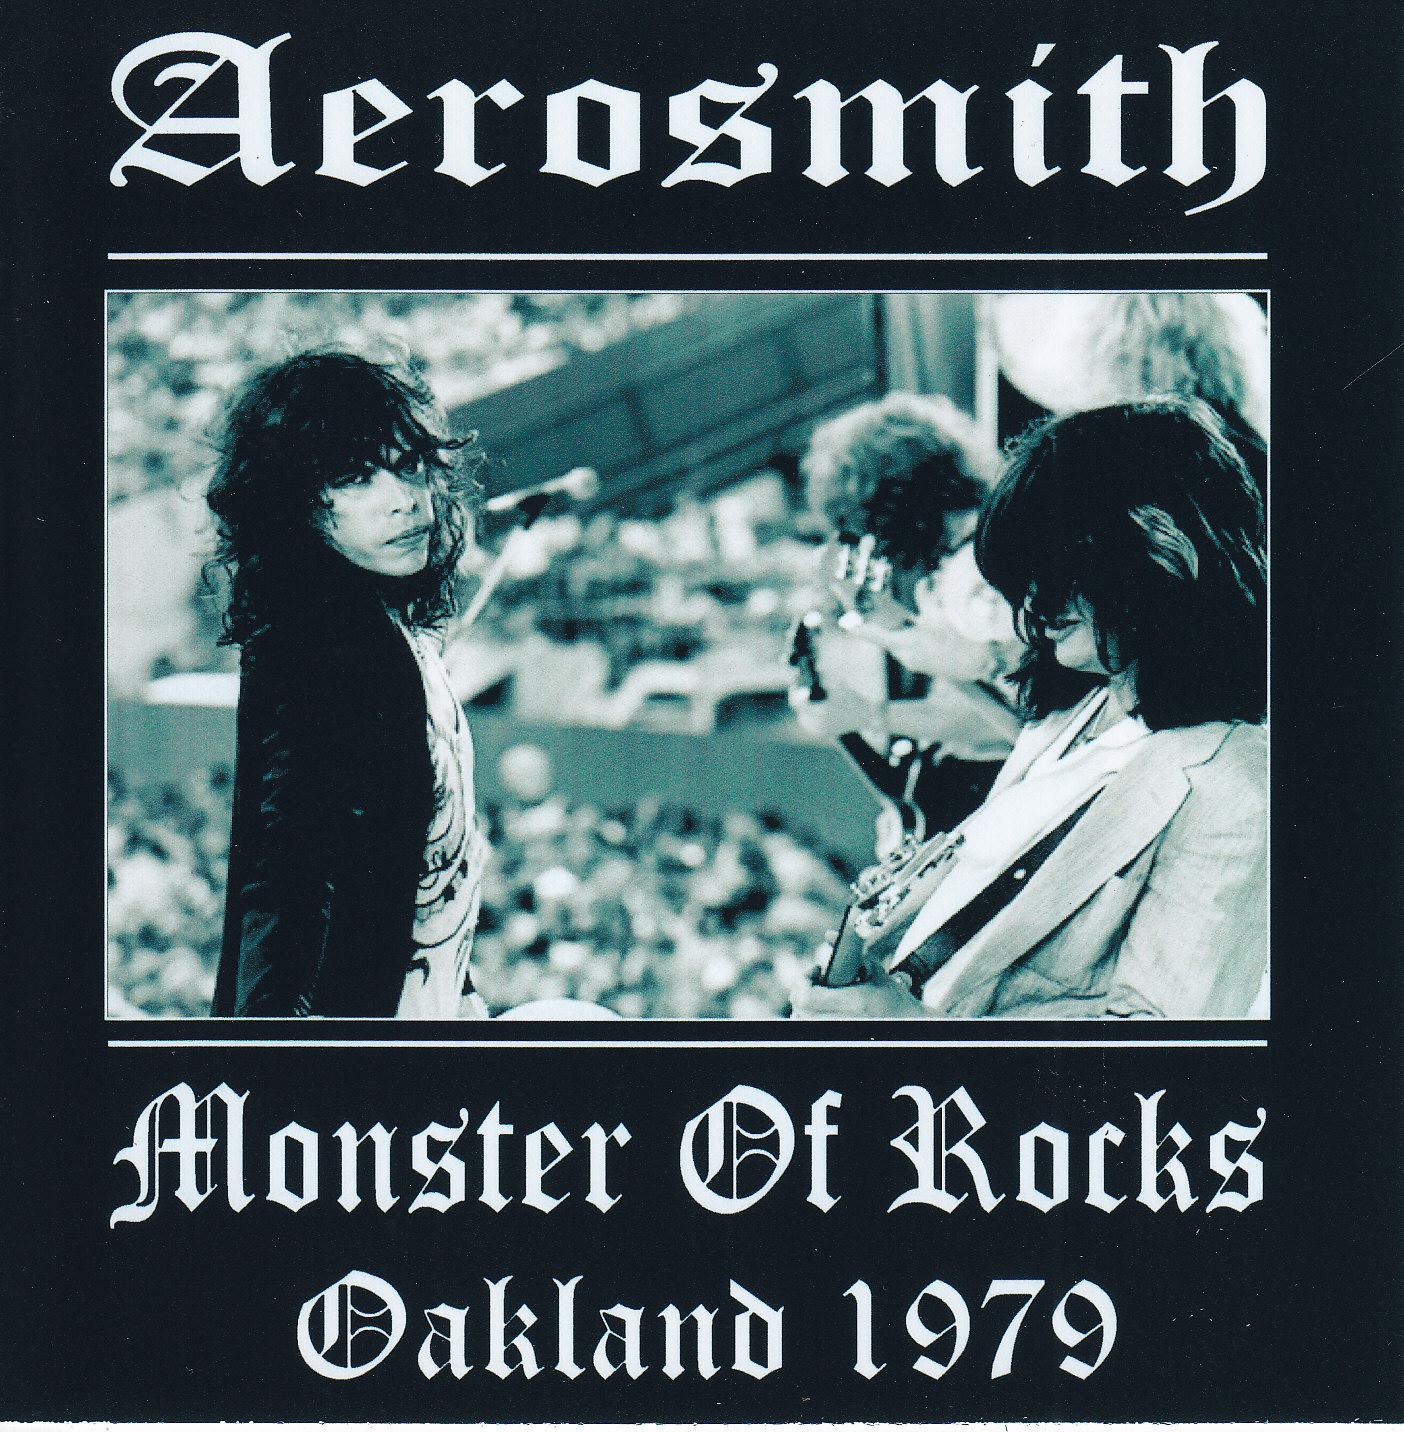 Aerosmith 1979